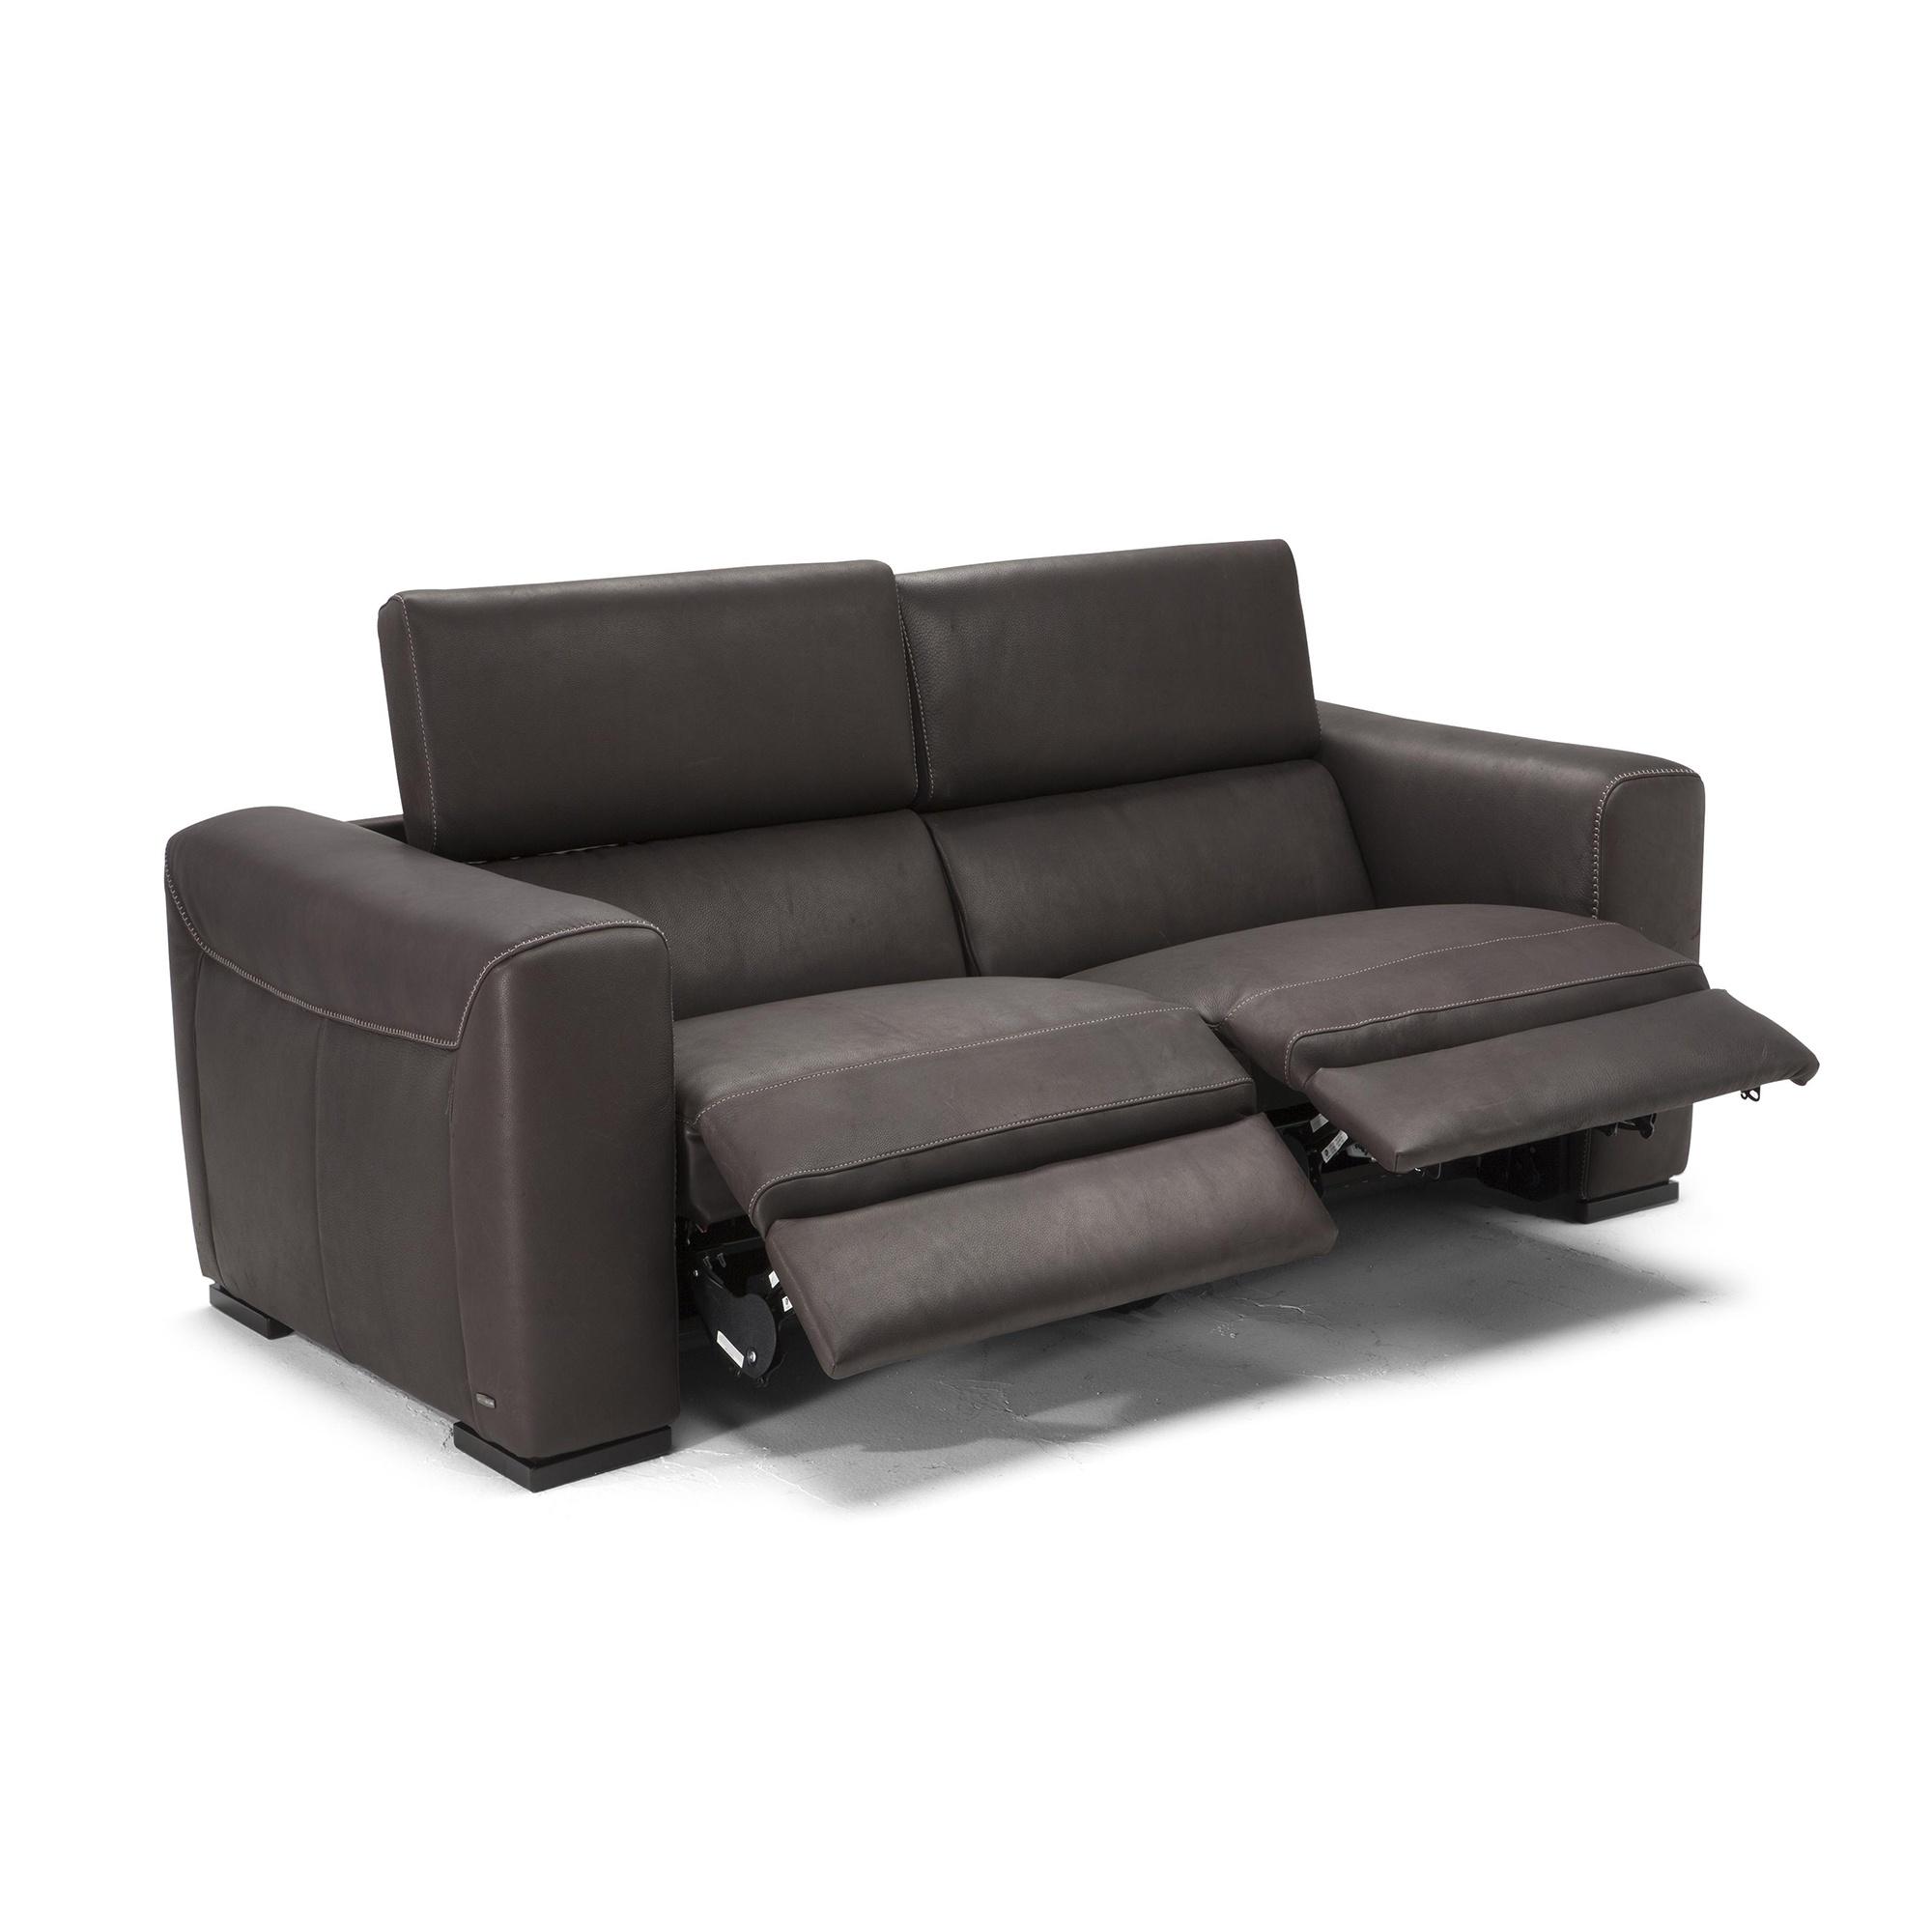 Pleasant Natuzzi Editions Forza Electric Recliner Loveseat Evergreenethics Interior Chair Design Evergreenethicsorg